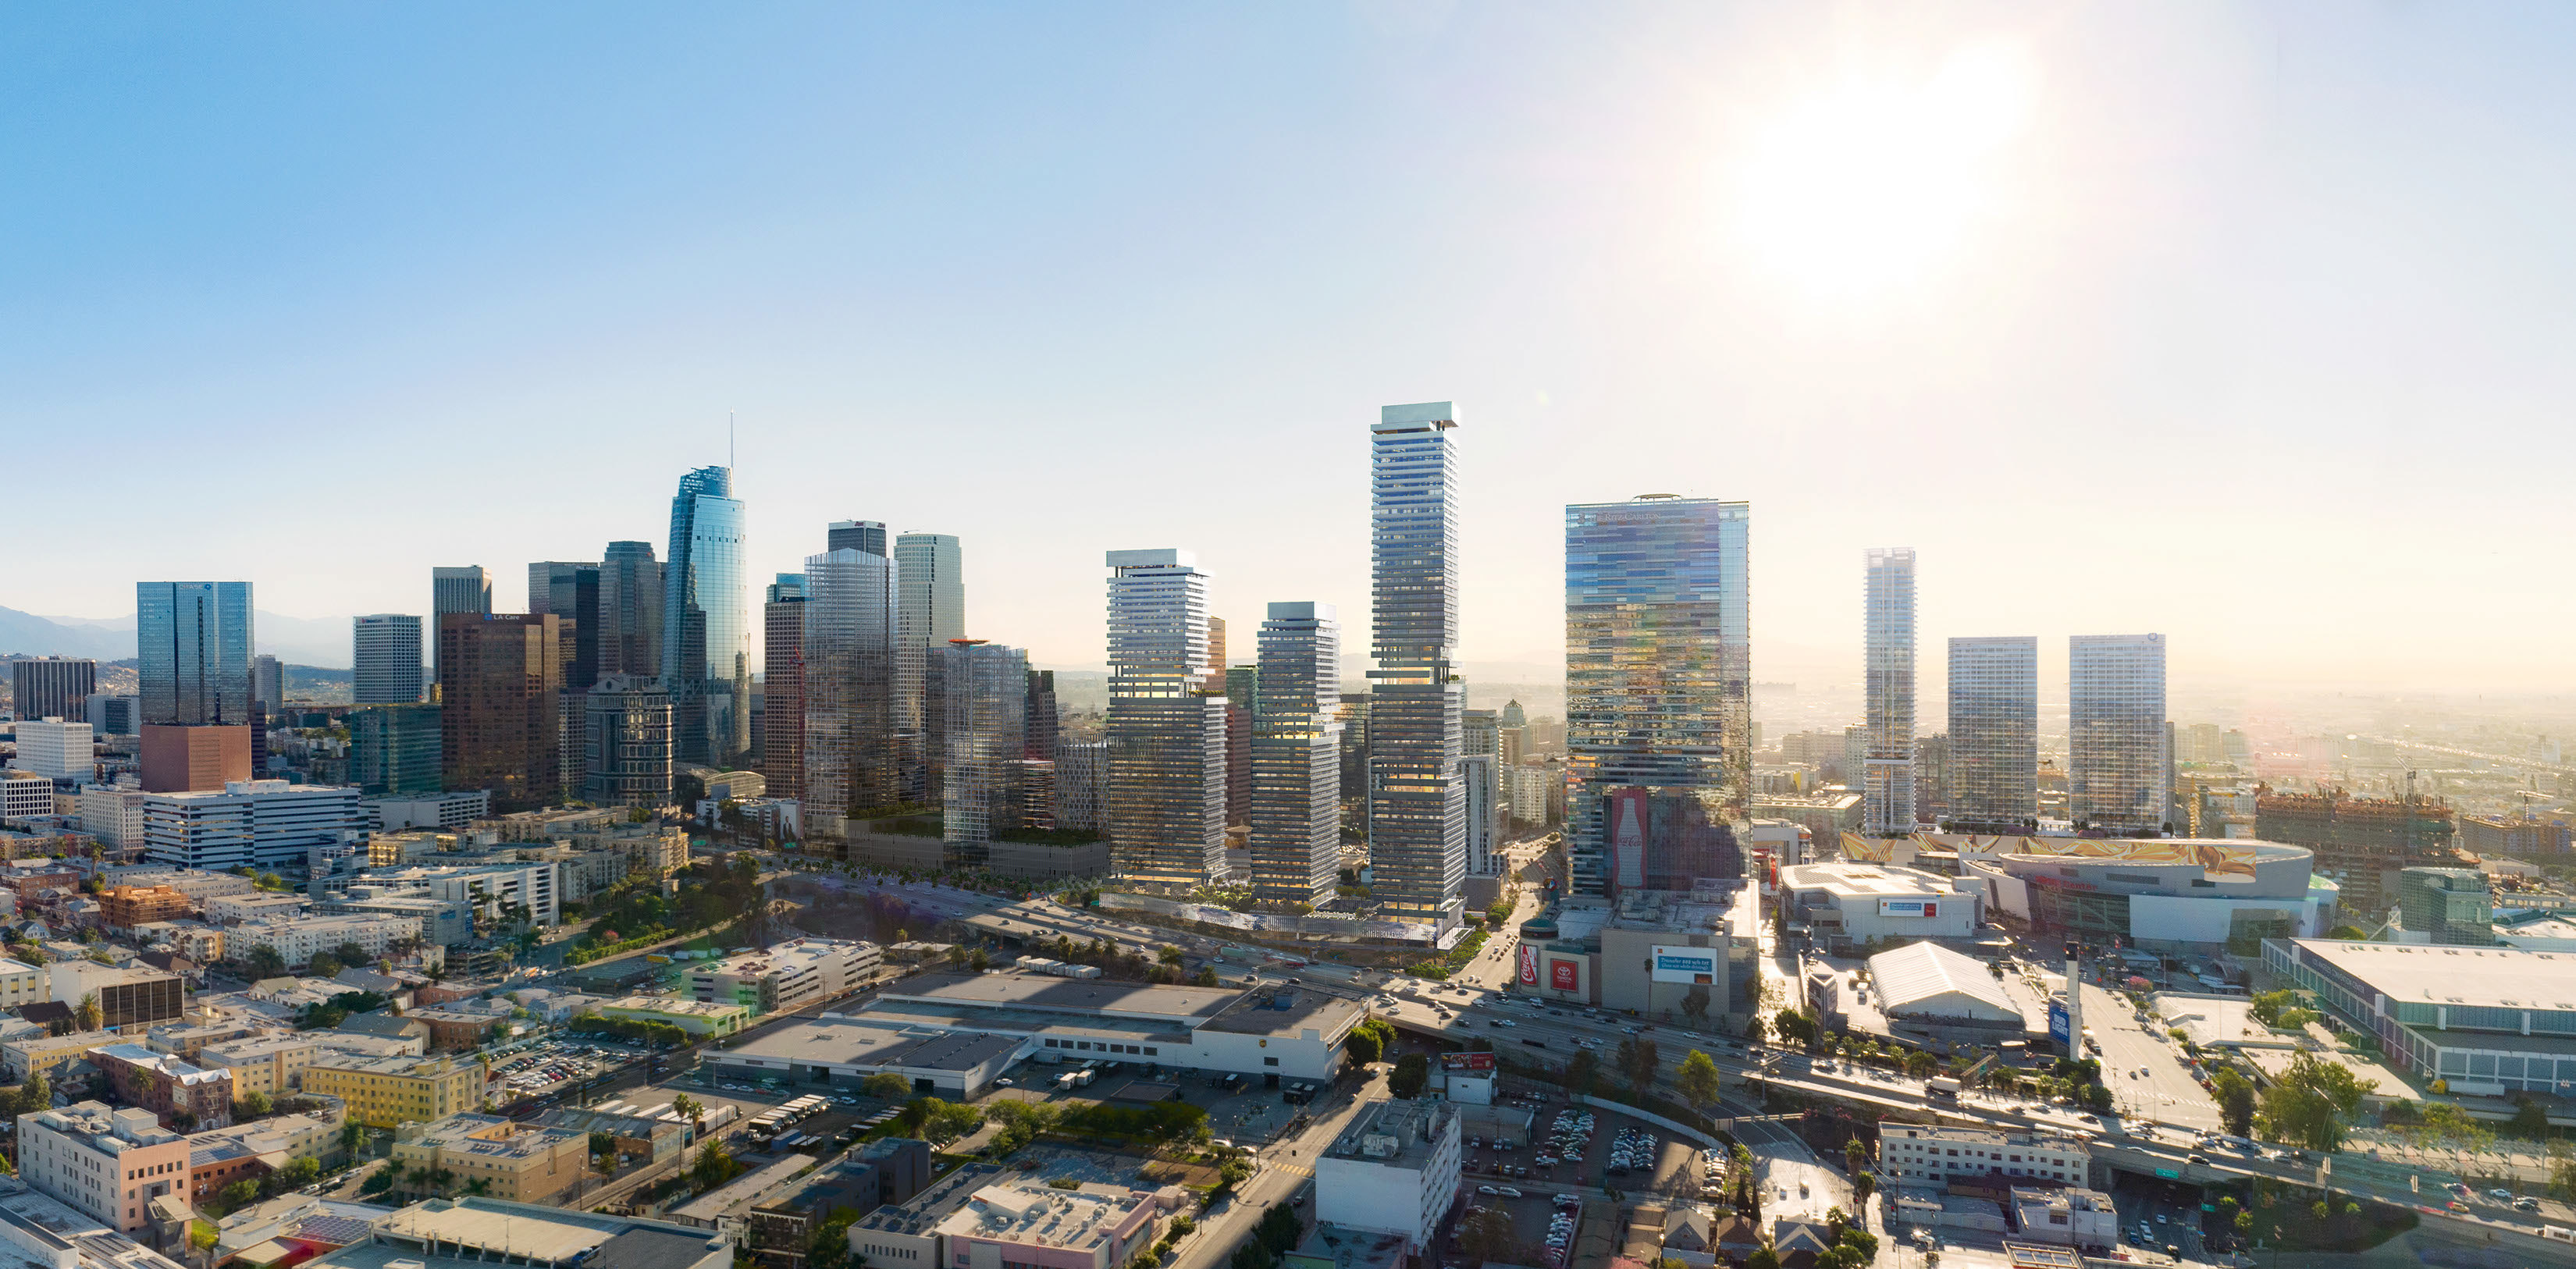 downtown LA skyline rendering glass reflection sunlight